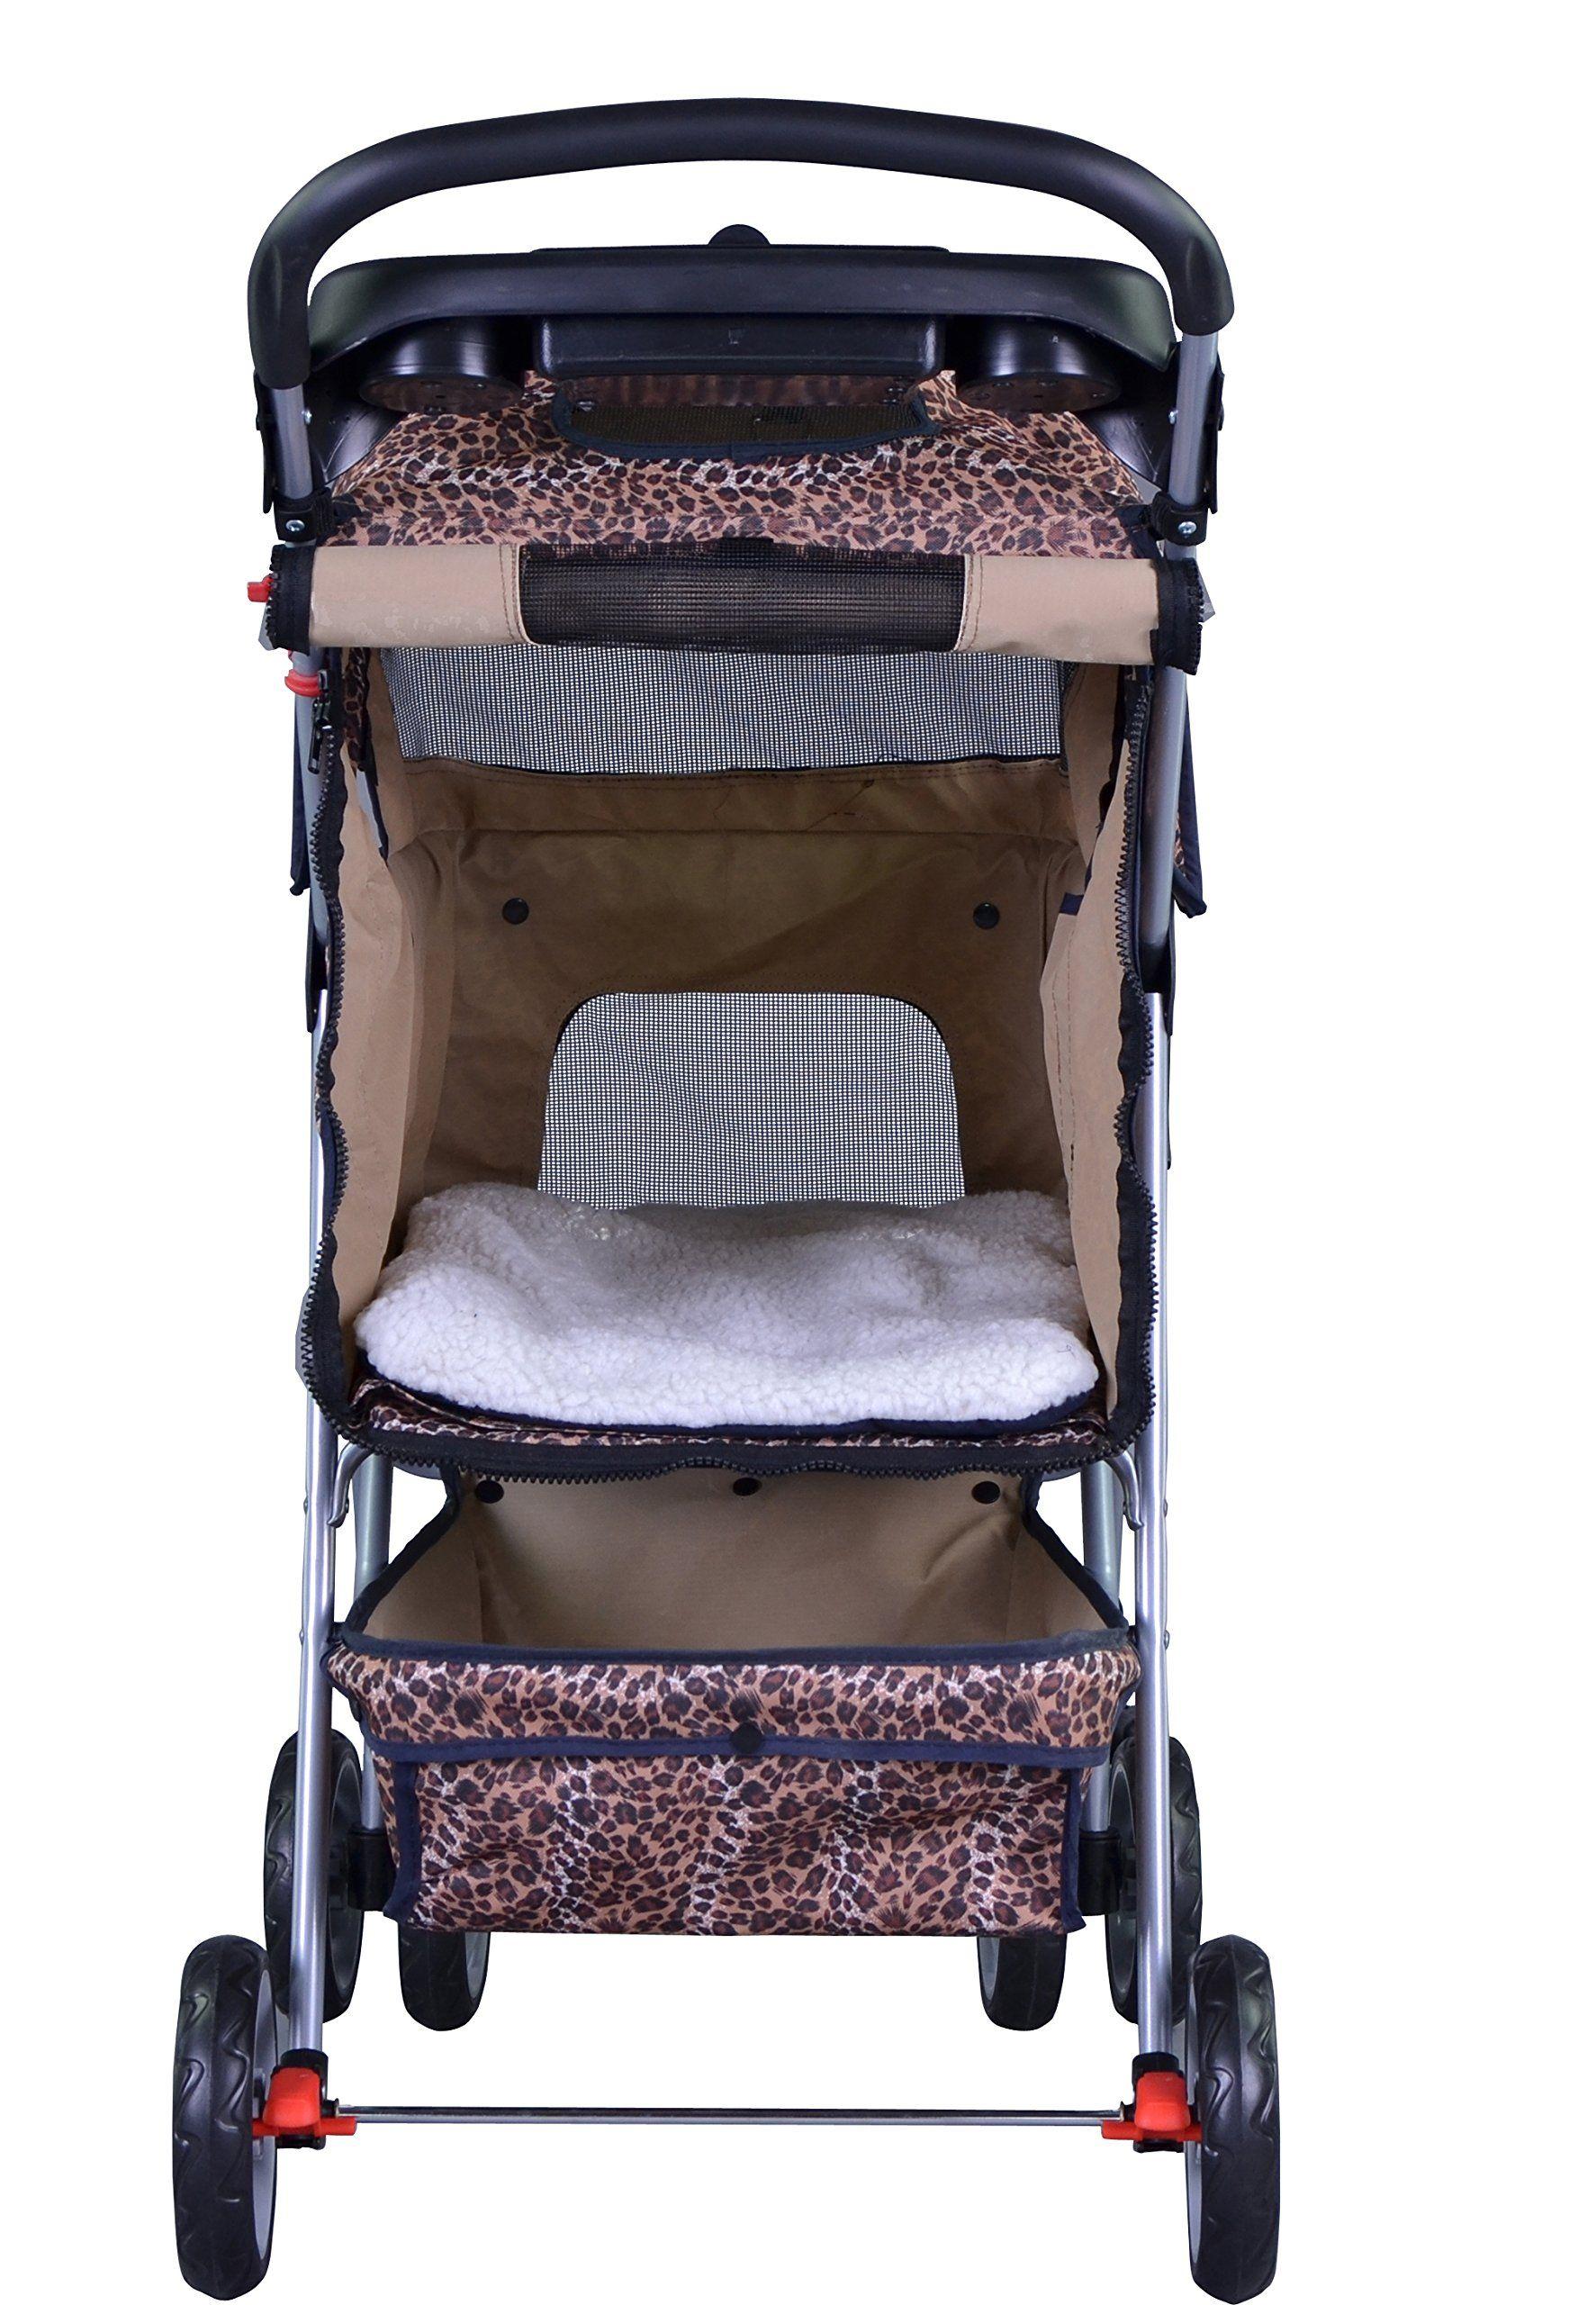 Leopard Skin 4 Wheels Pet Dog Cat Stroller w/RainCover